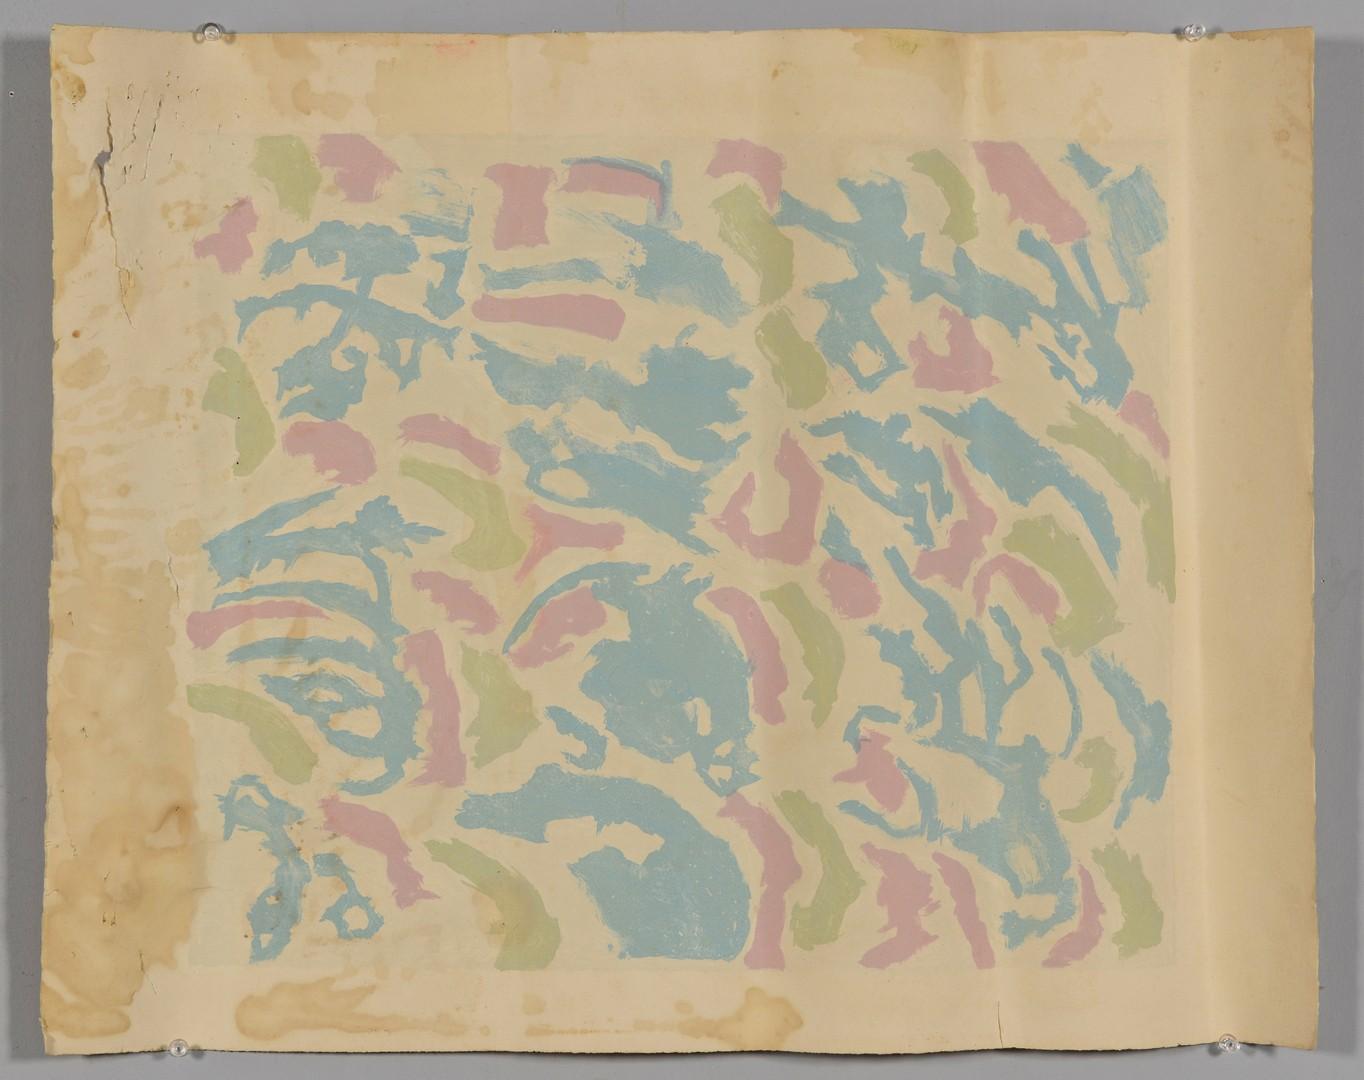 Lot 318: Beauford Delaney, Afrique Lithography